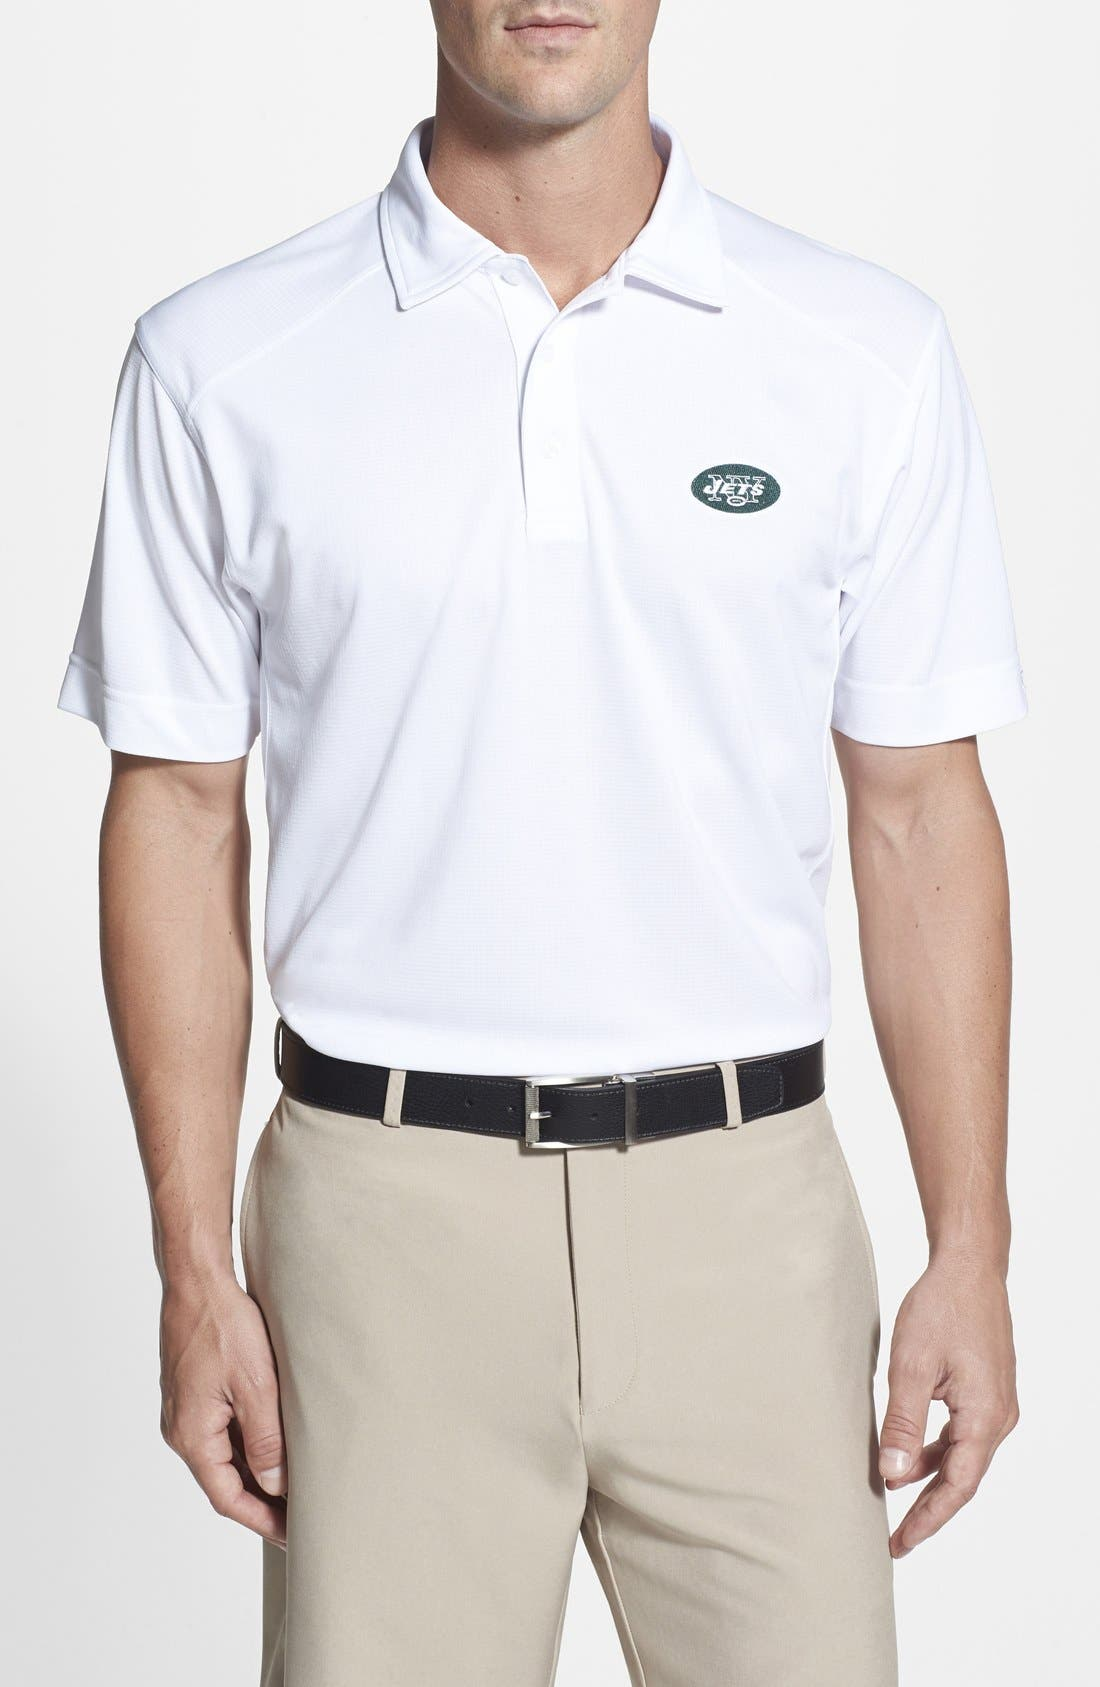 Cutter & Buck 'New York Jets - Genre' DryTec Moisture Wicking Polo (Big & Tall)